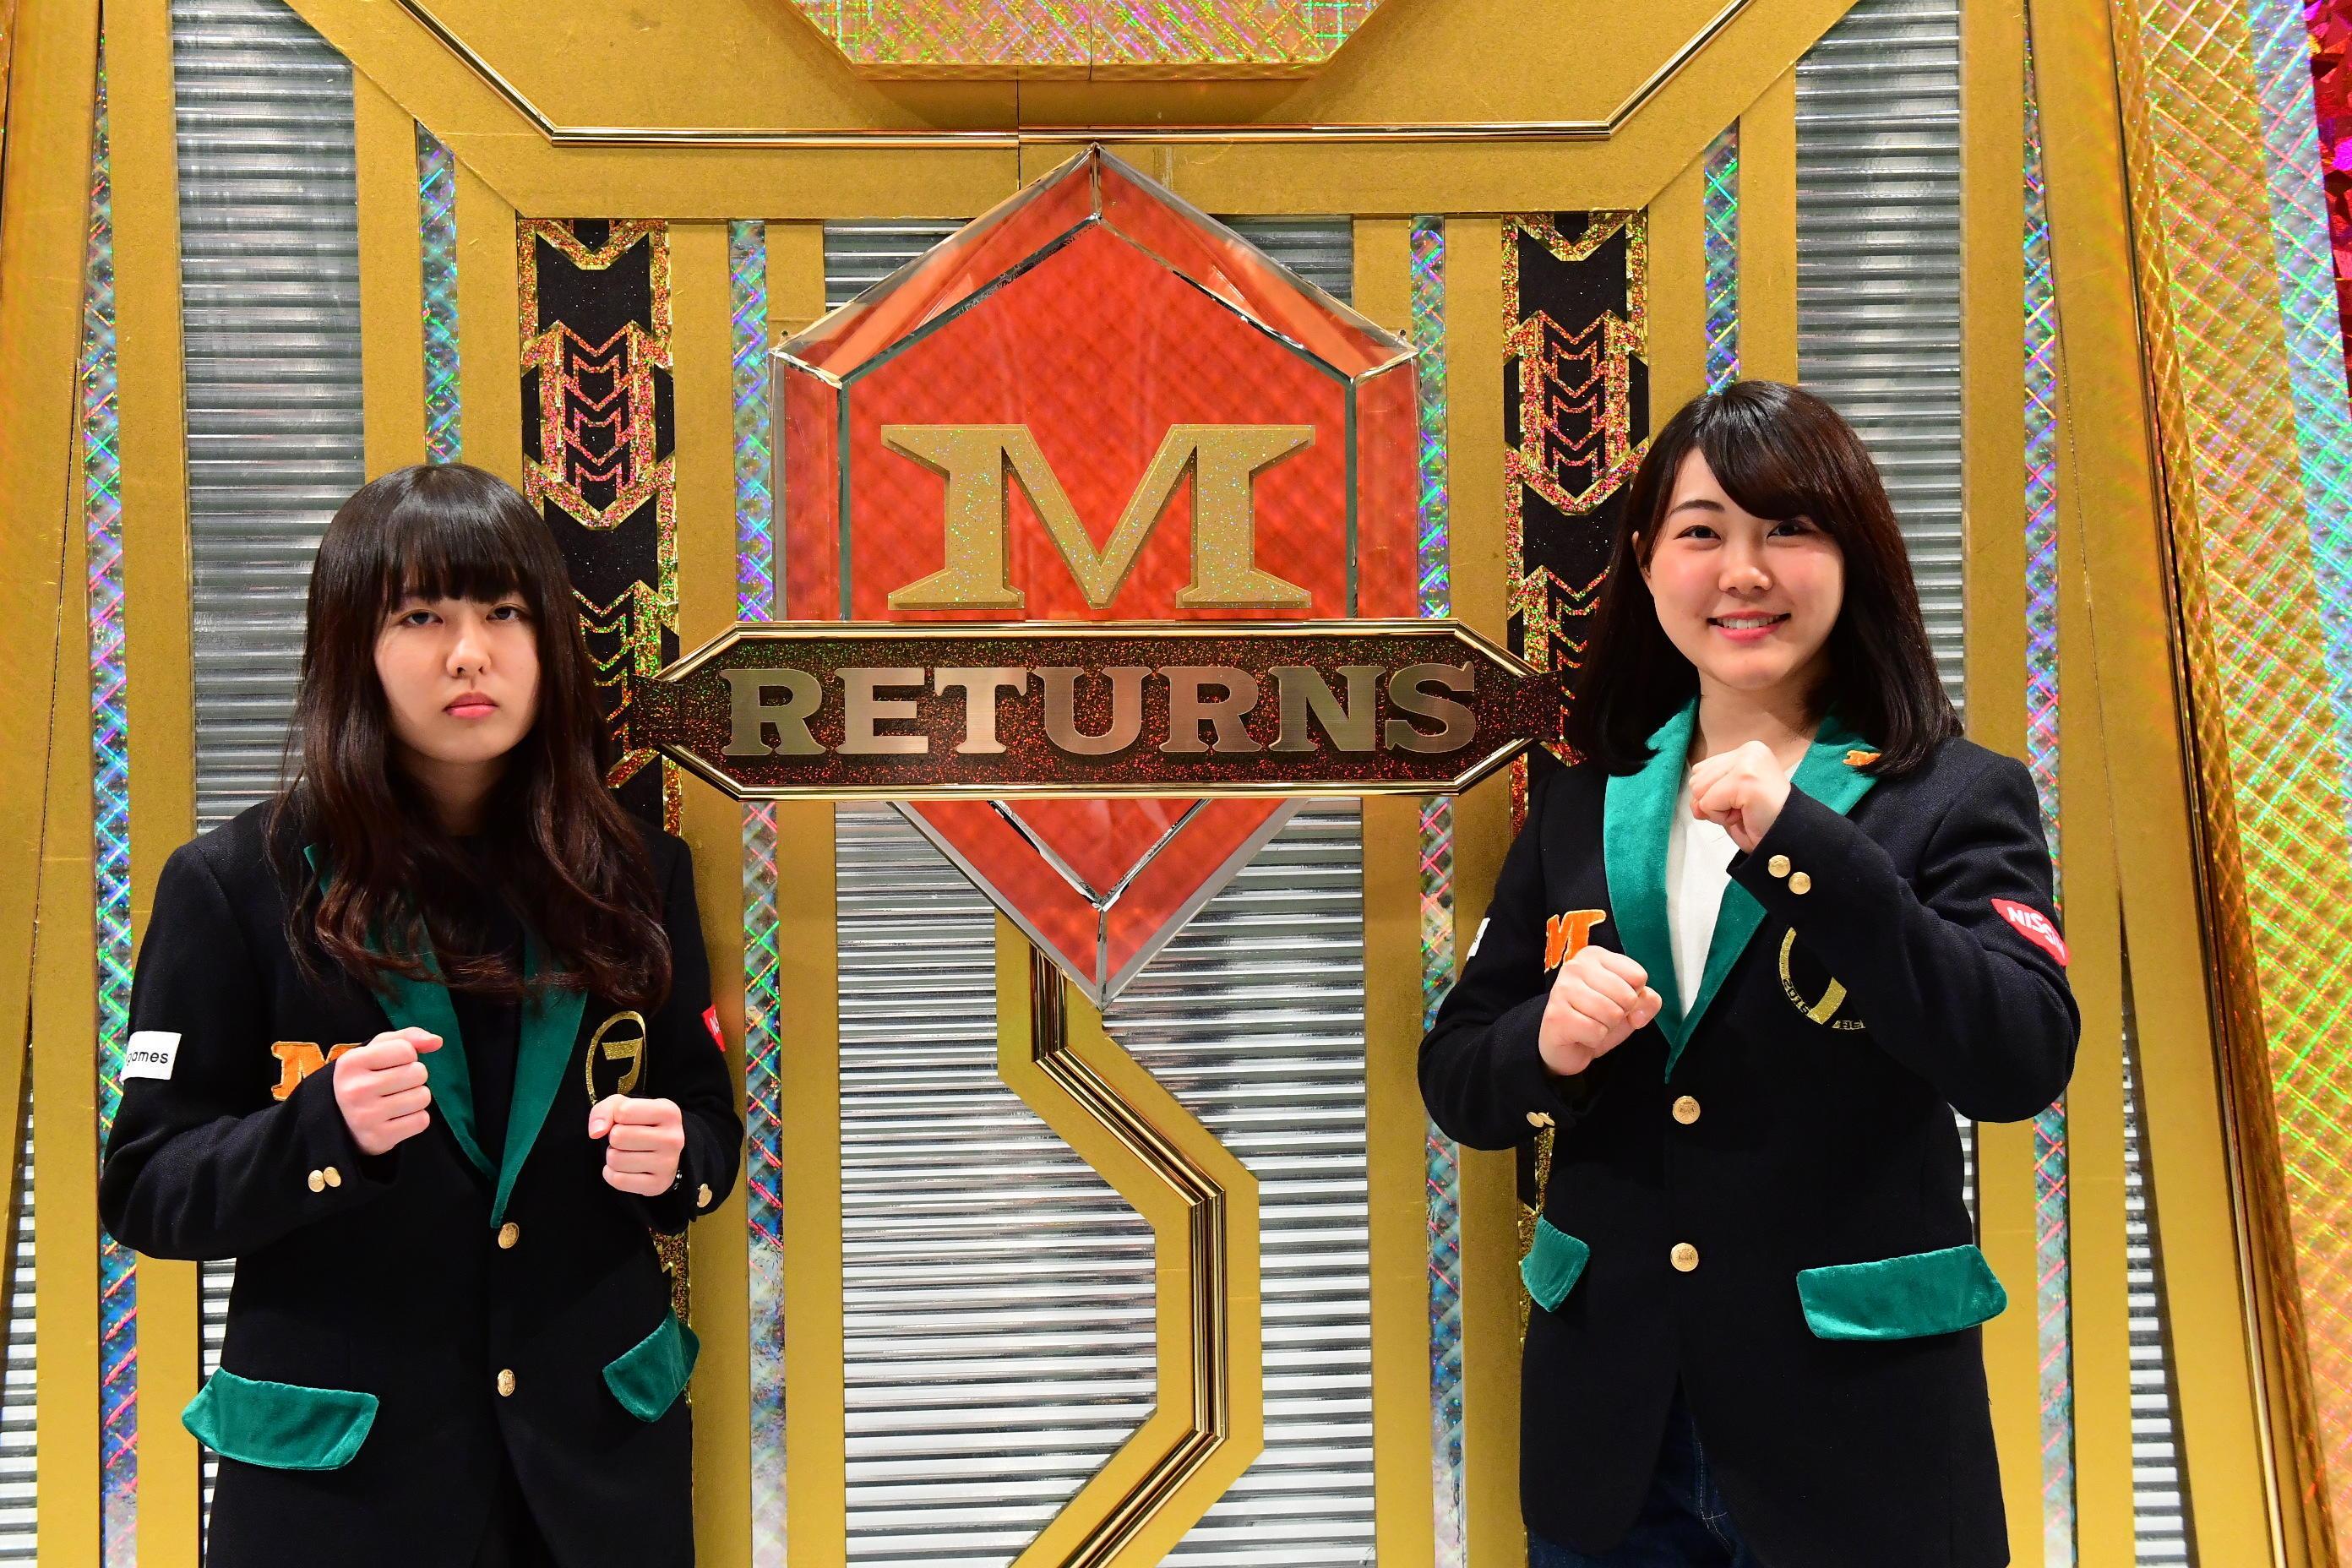 http://news.yoshimoto.co.jp/20170228160215-d32e5abafe0ccc72a11be1098ec6b634729bdcc8.jpg